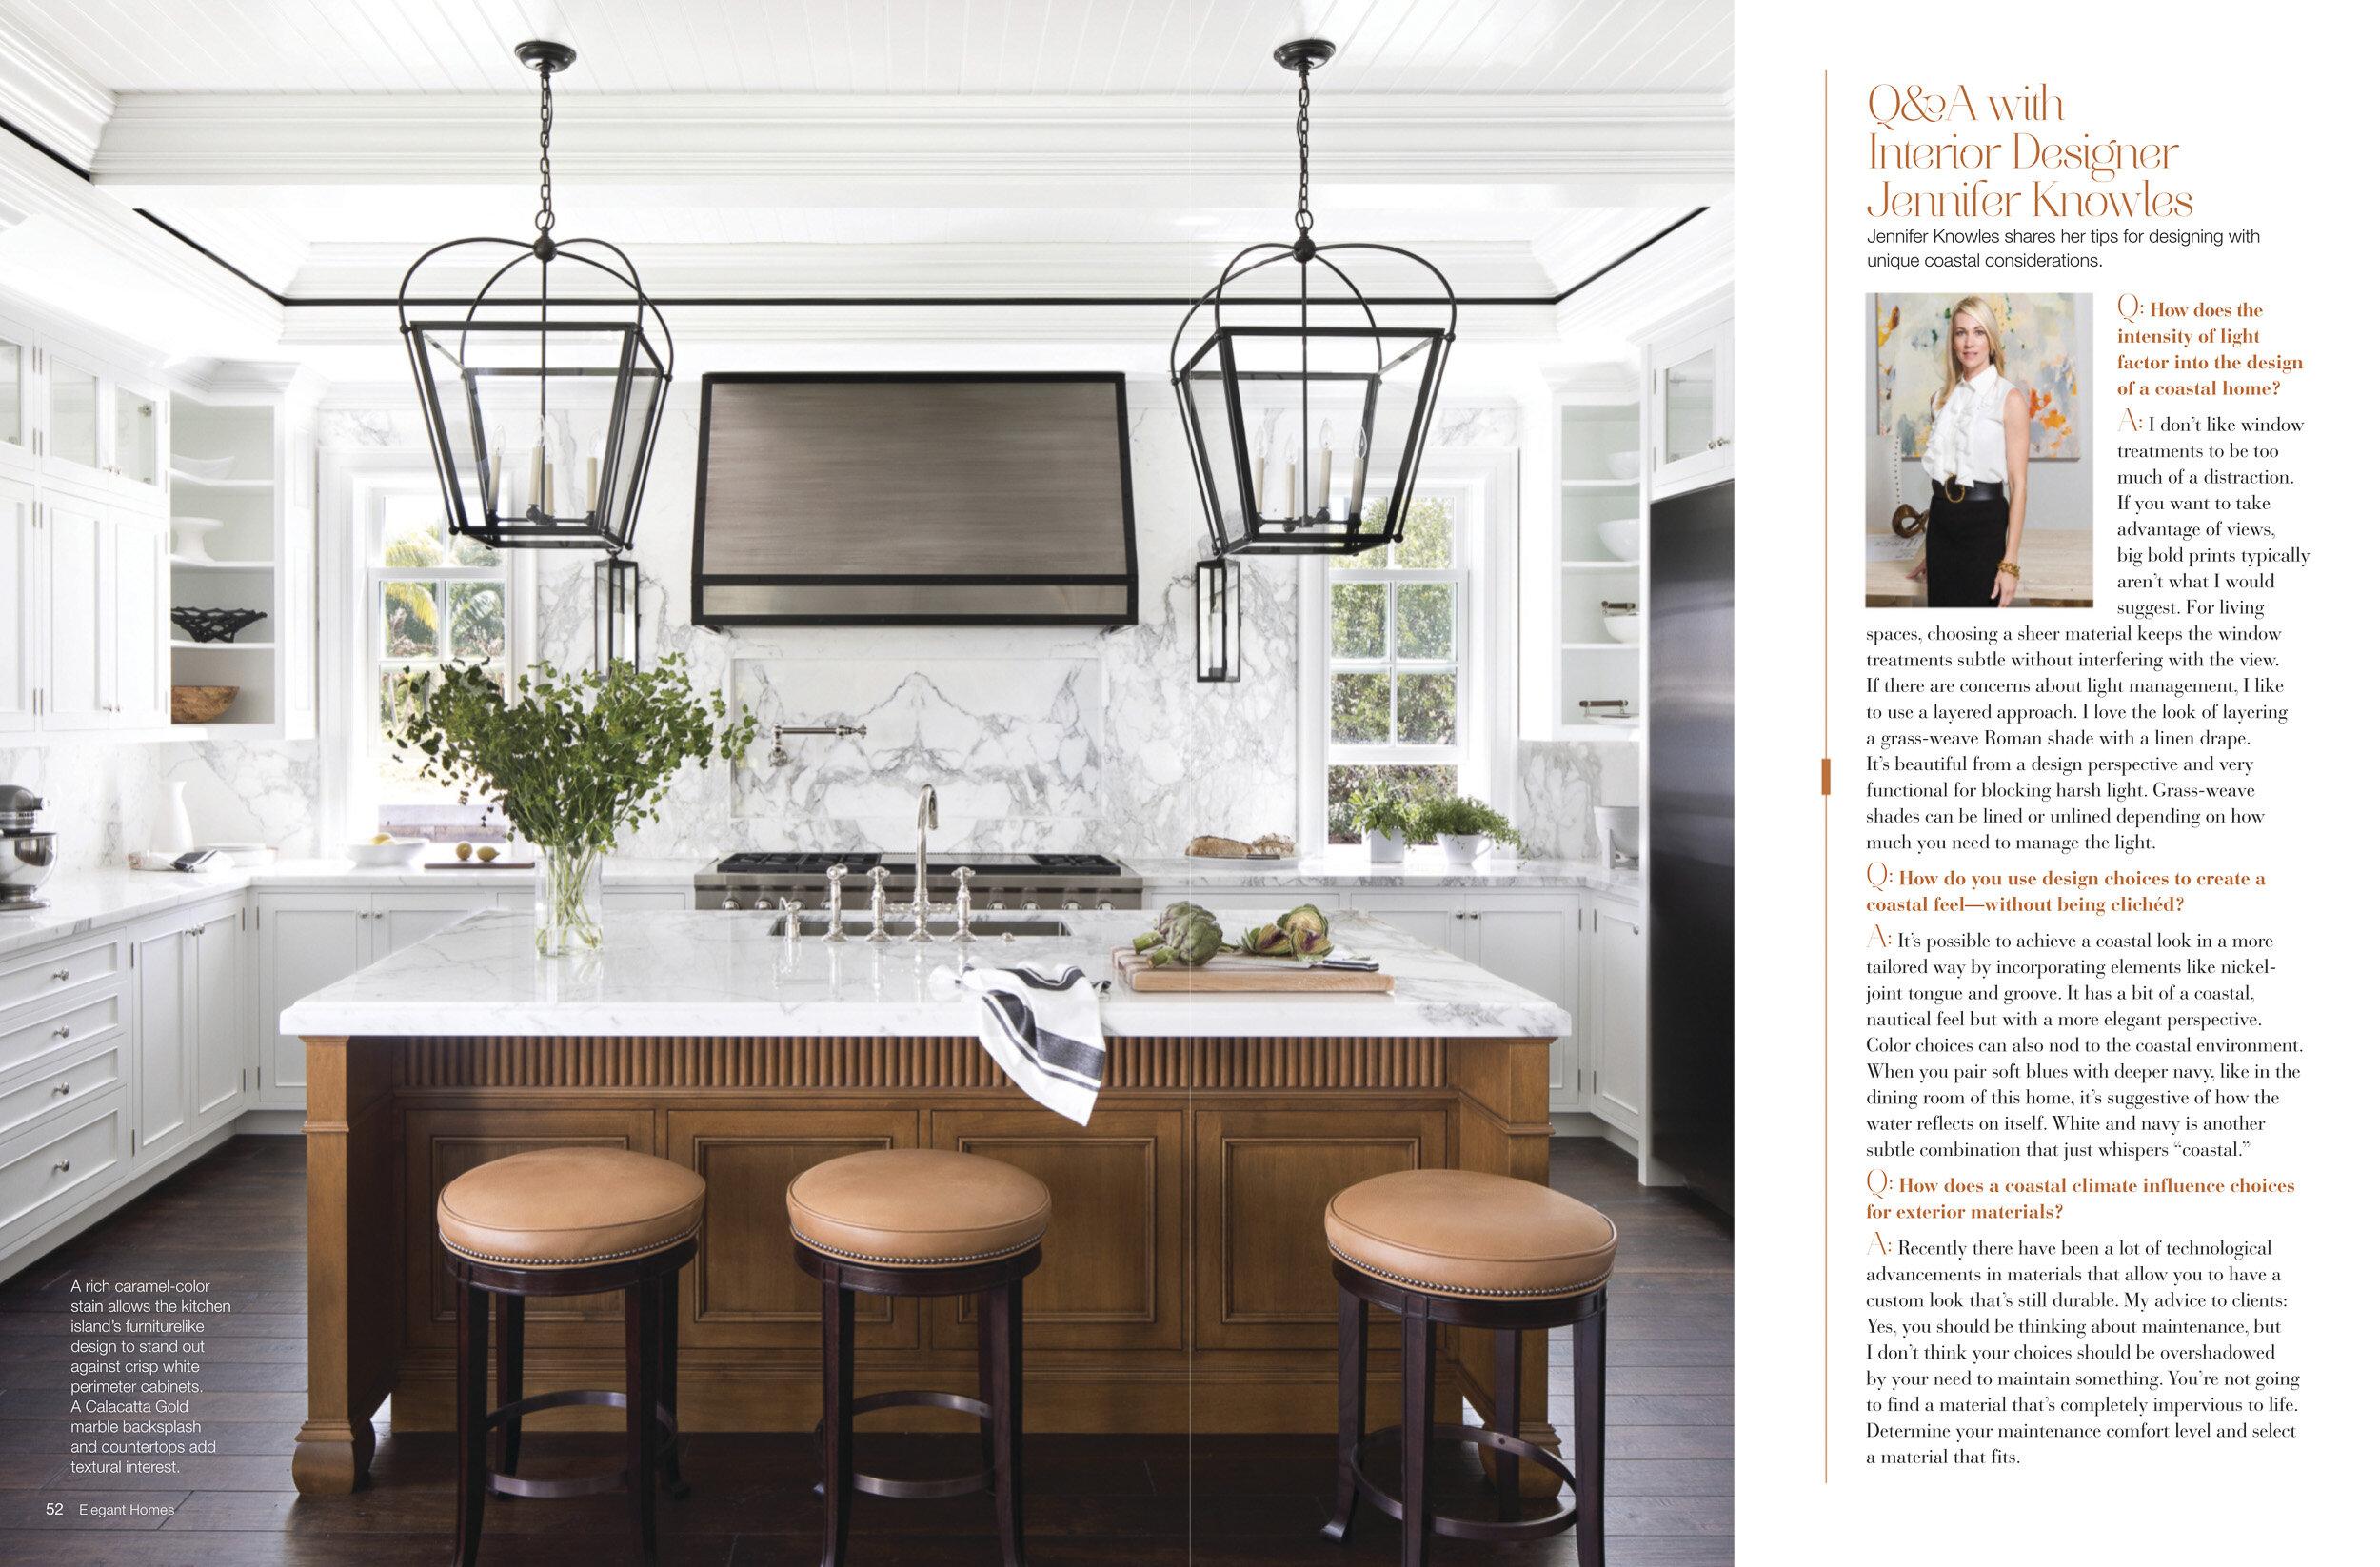 knowles-design-media-elegant-homes-fall-2019-feature-spread-03.jpg